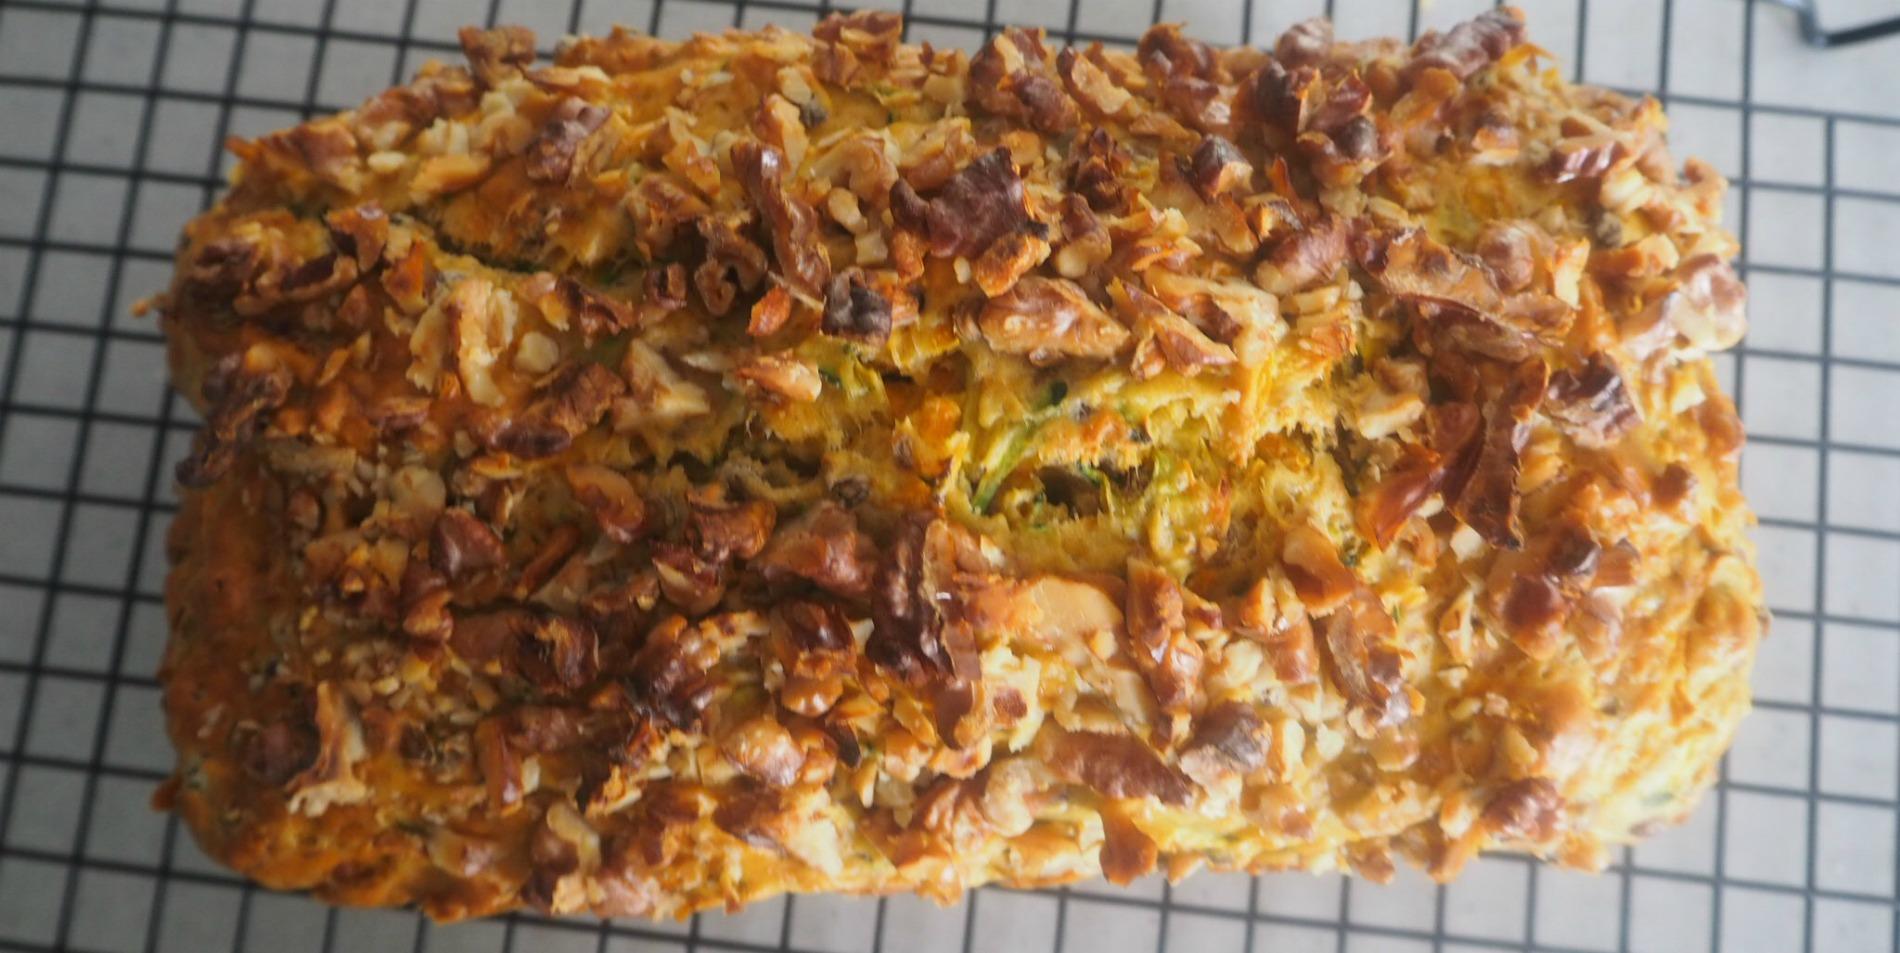 tradies lunchbox vegetable and lentil loaf